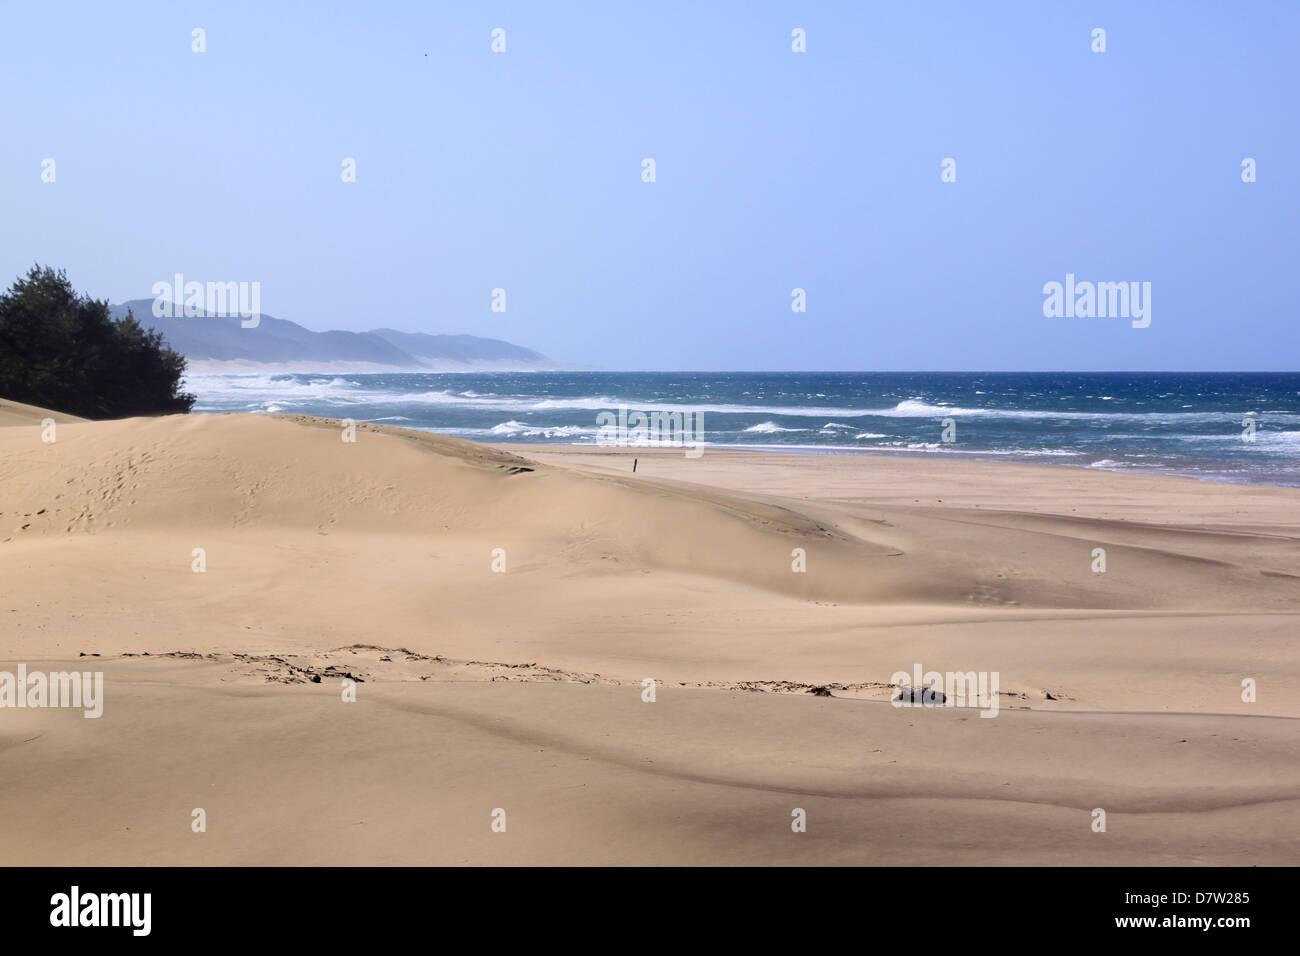 Der Strand, St. Lucia Wetlands, Kwa-Zulu Natal, Südafrika Stockfoto